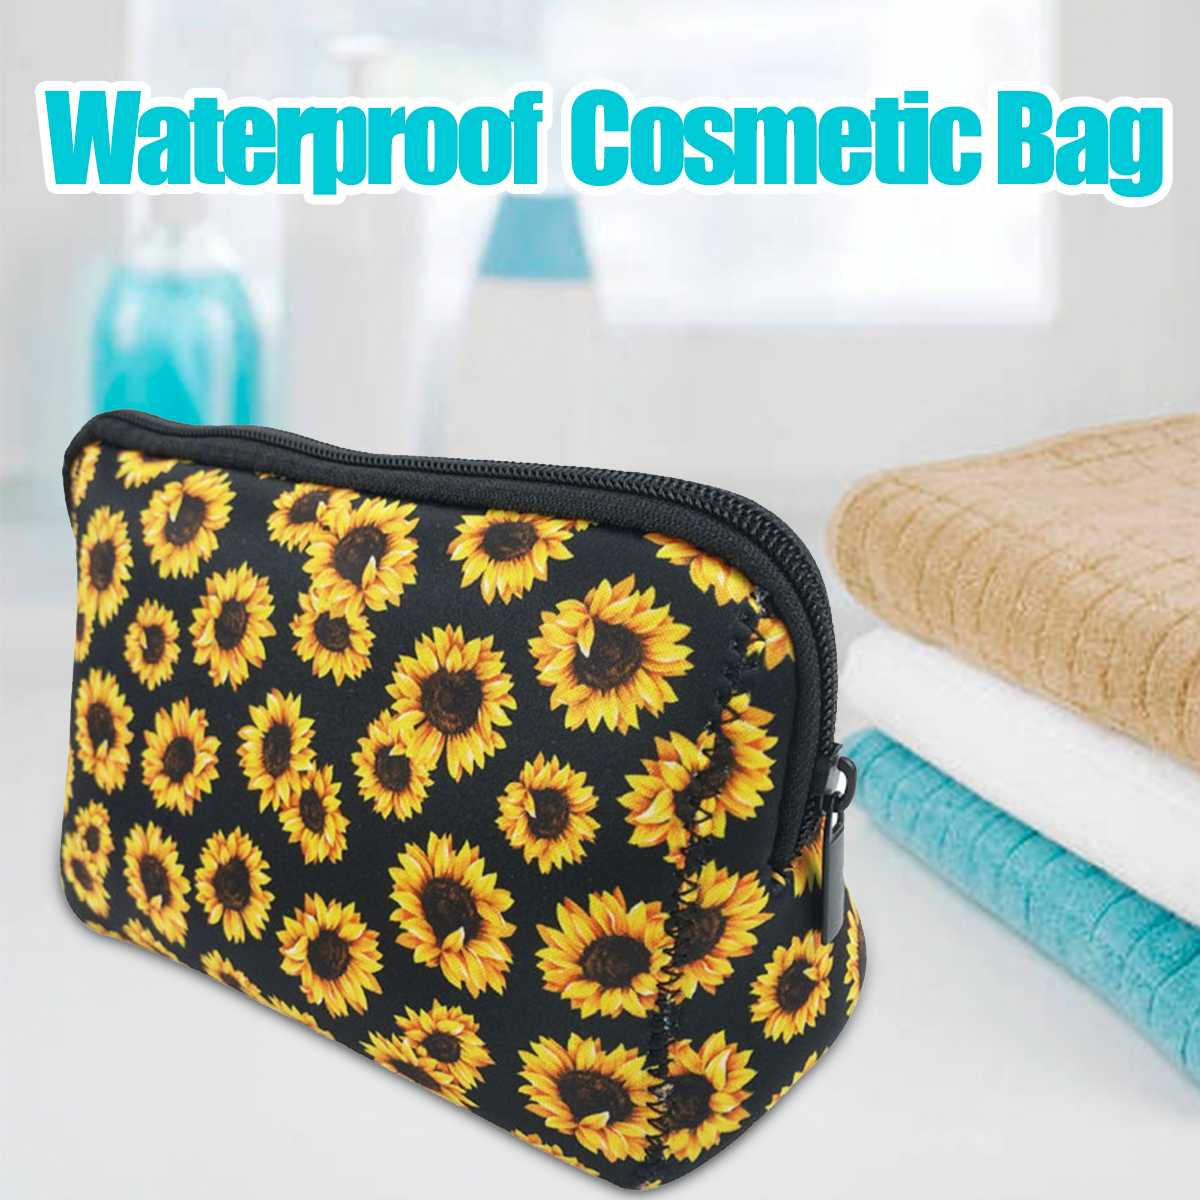 Waterproof Sunflower Travel Cosmetic Bag Makeup Case Women Zipper Make Up Handbag Organizer Storage Pouch Toiletry Wash Bag